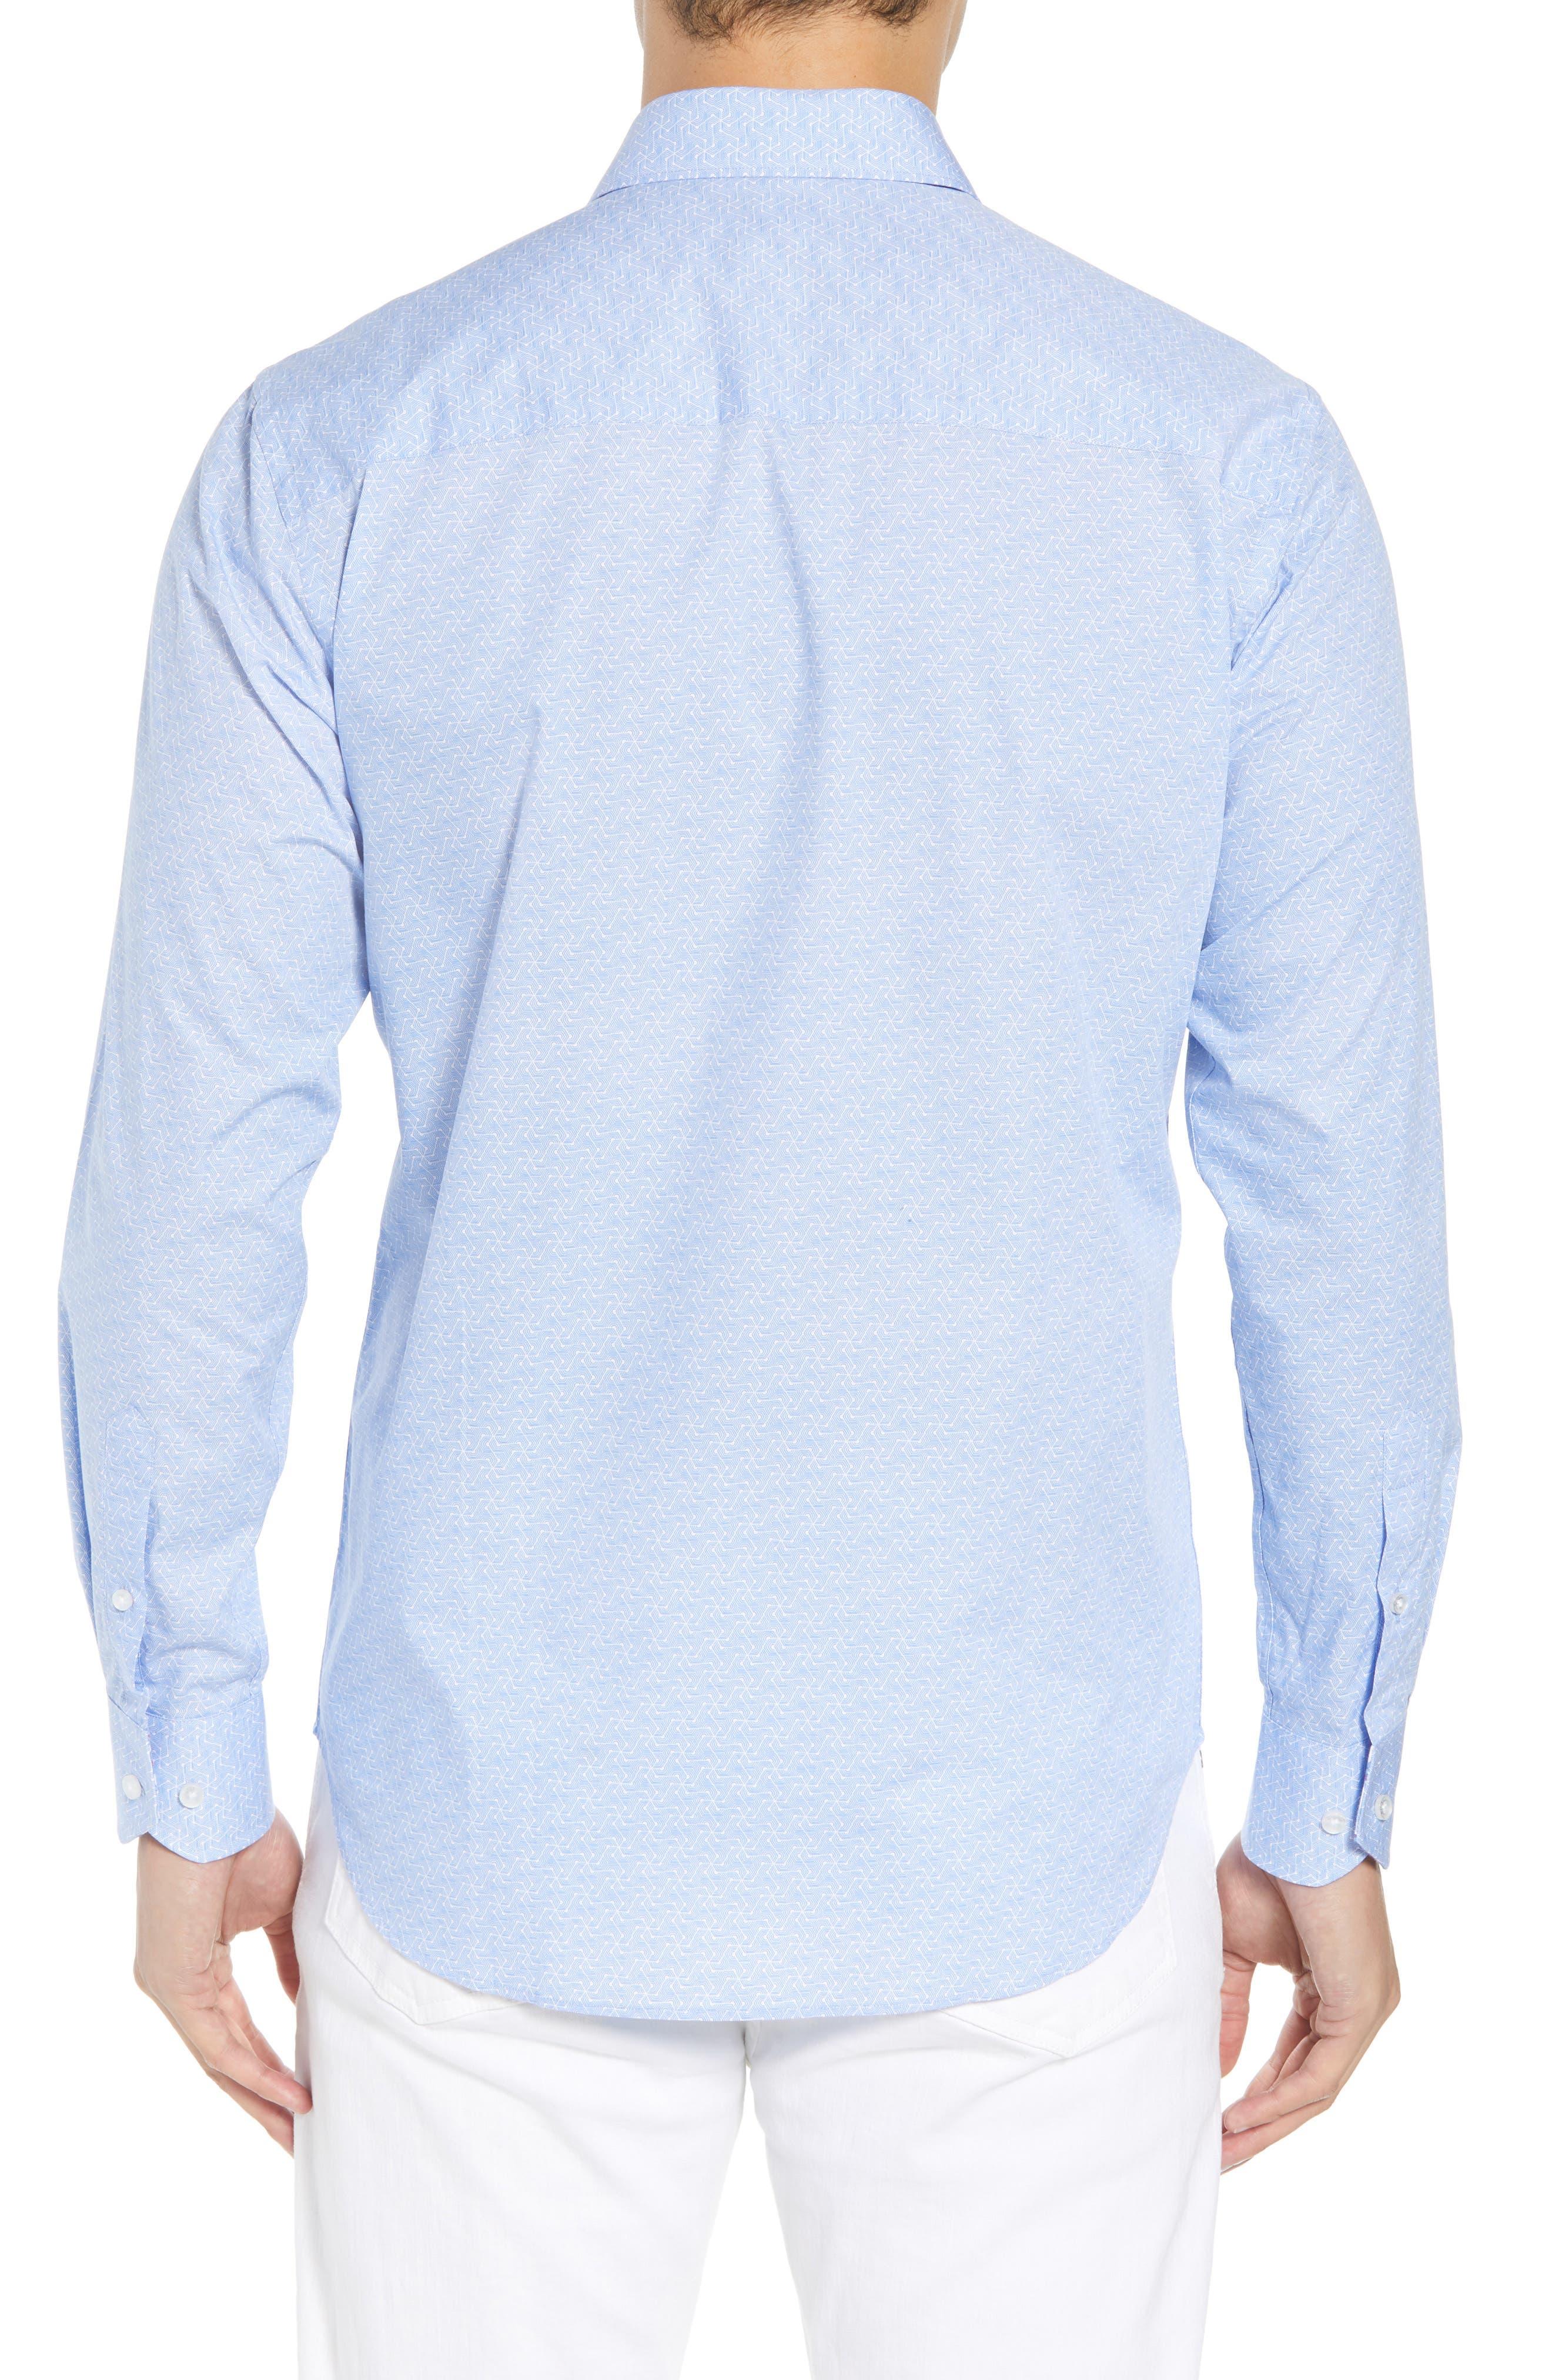 Beckham Regular Fit Plaid Sport Shirt,                             Alternate thumbnail 3, color,                             Light Blue